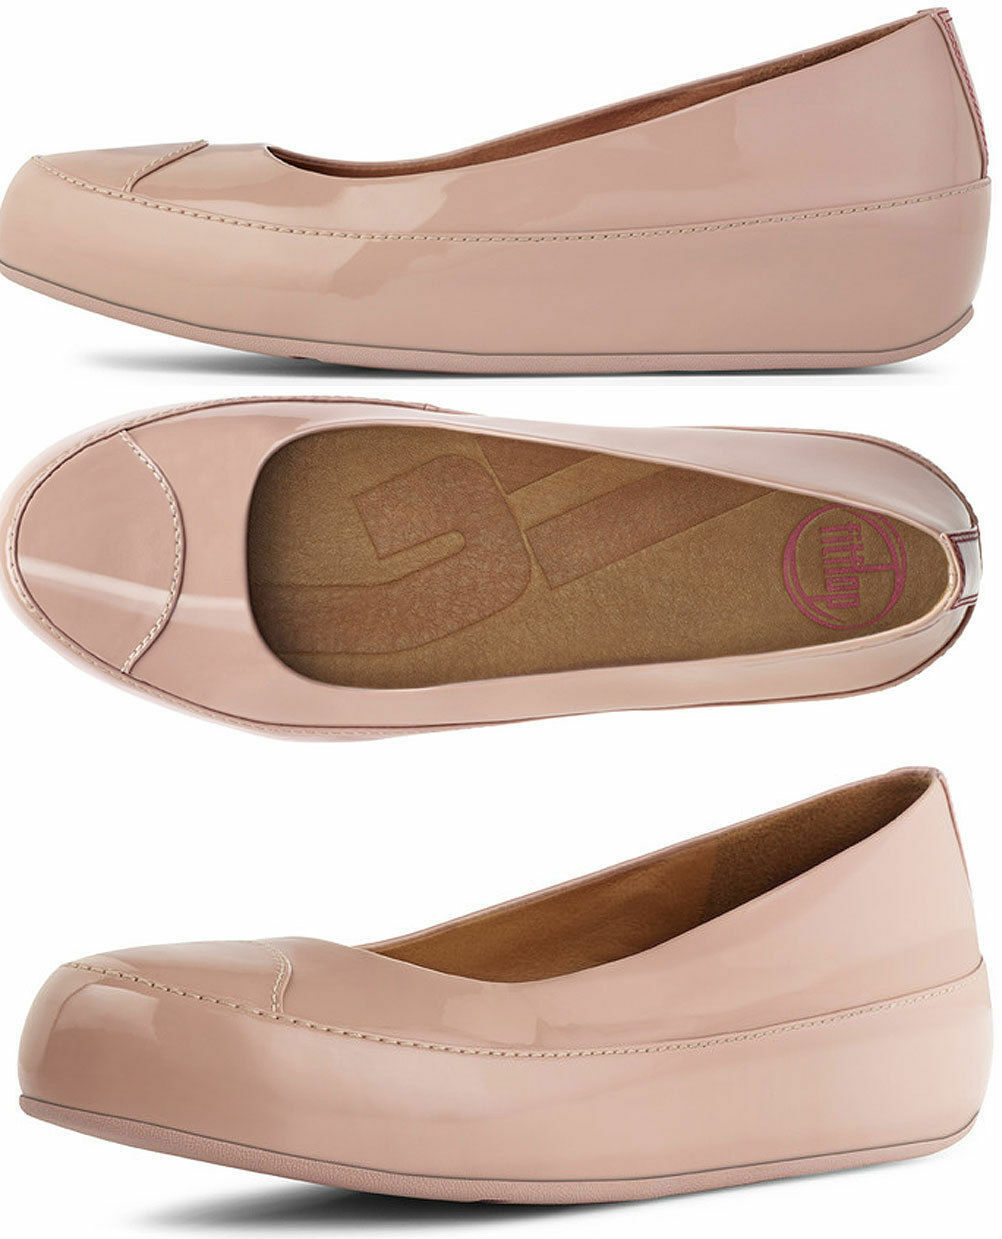 FITFLOP DUE NUDE PATENT LEATHER PLATFORM BALLERINA PUMPS Schuhe UK 6.5 /40